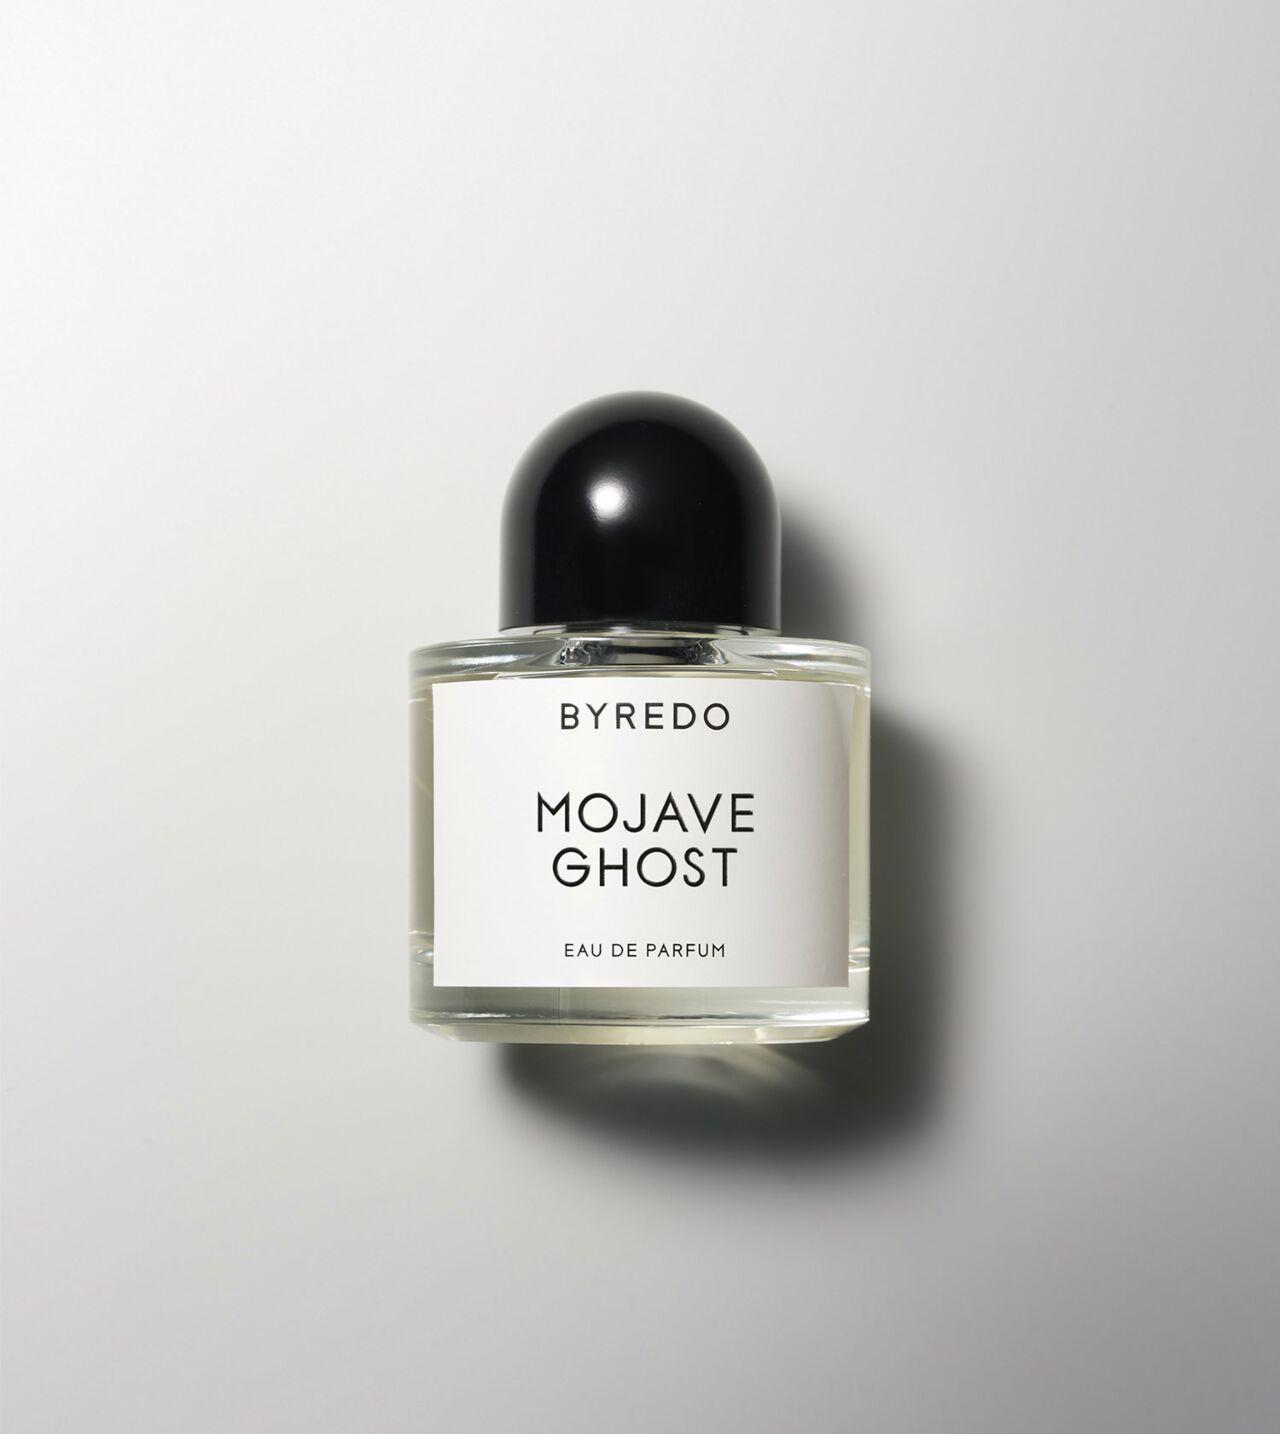 Picture of Byredo Mojave Ghost Eau de Parfum 50ml